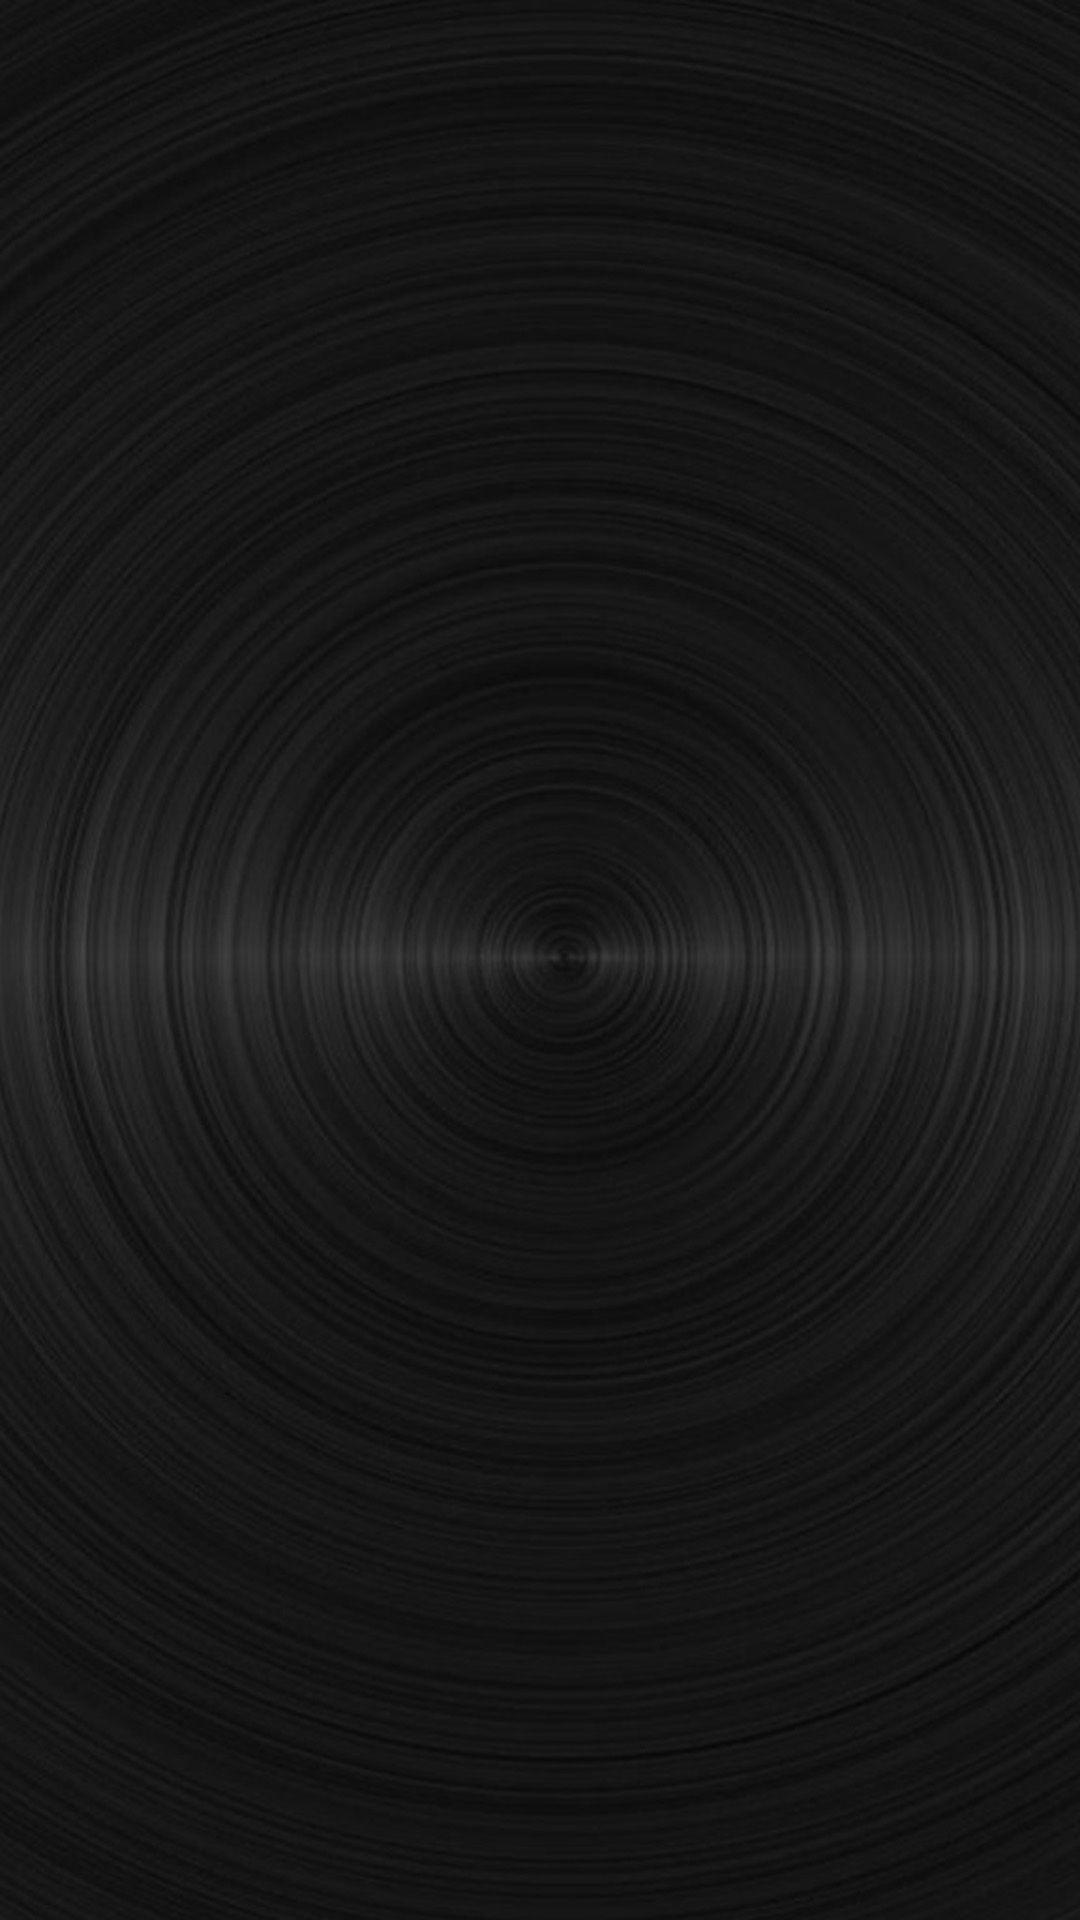 solid black wallpaper iphone wallpaper